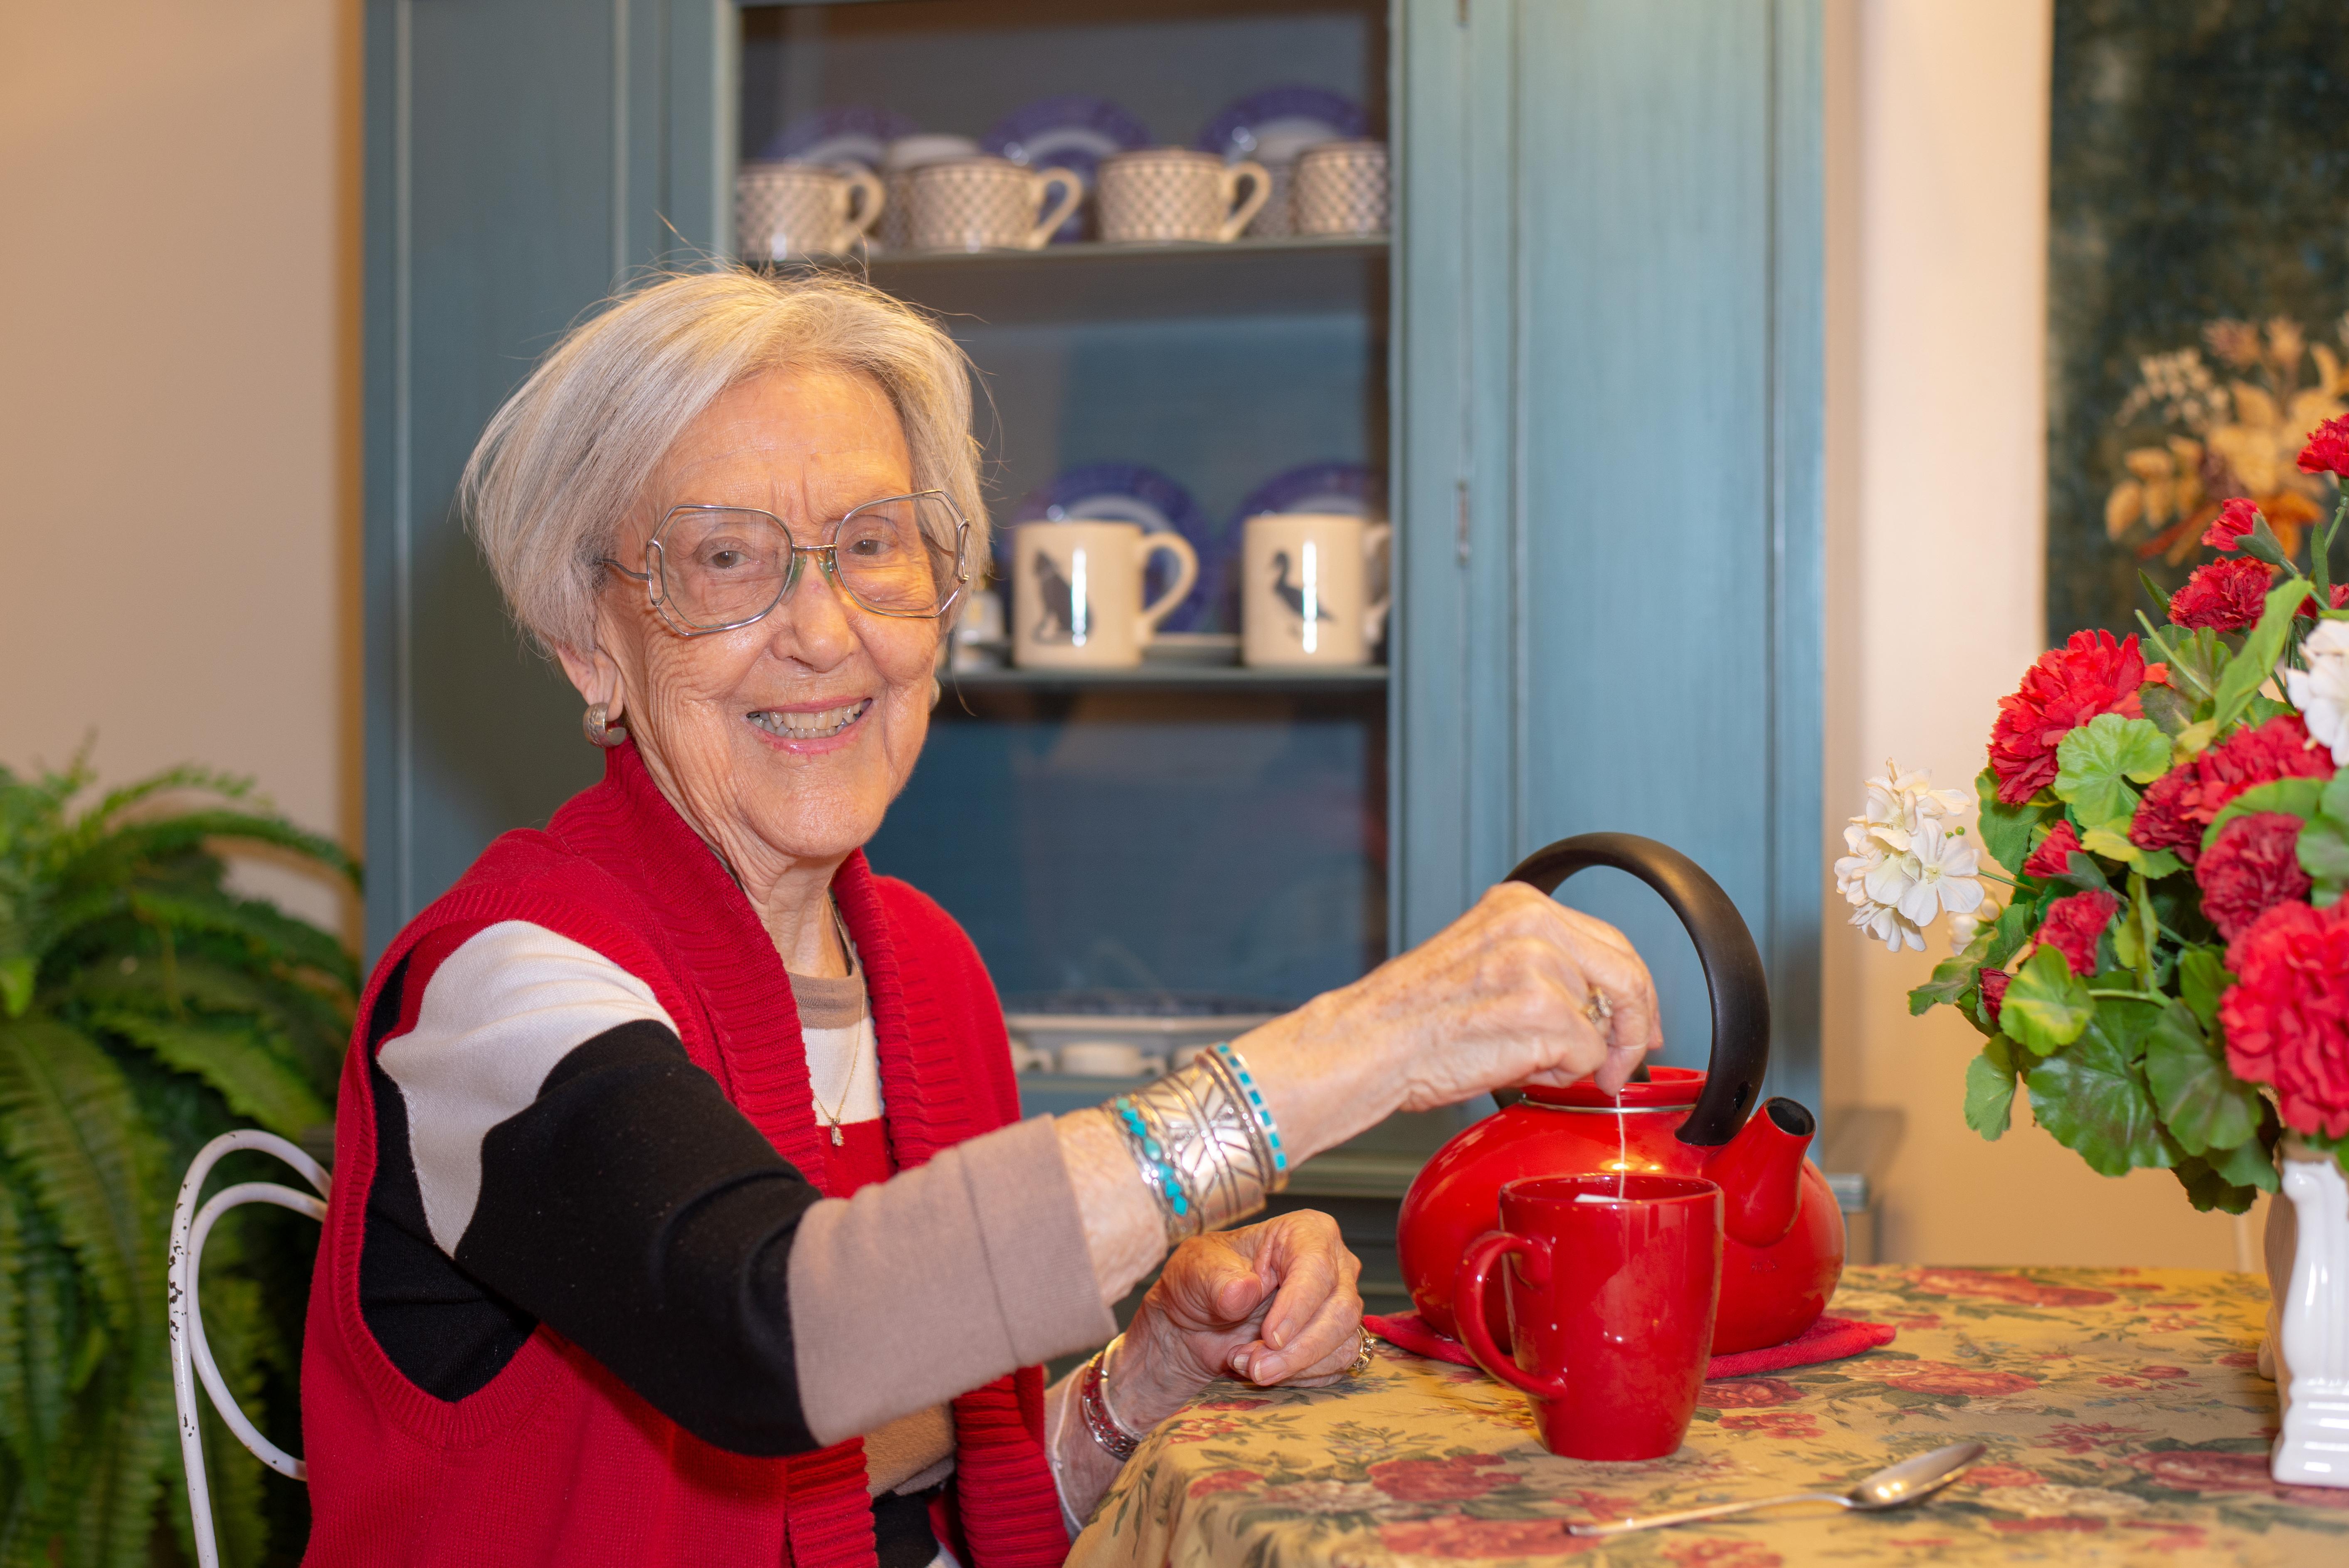 Senior Living Options Seminar and Dessert Tasting